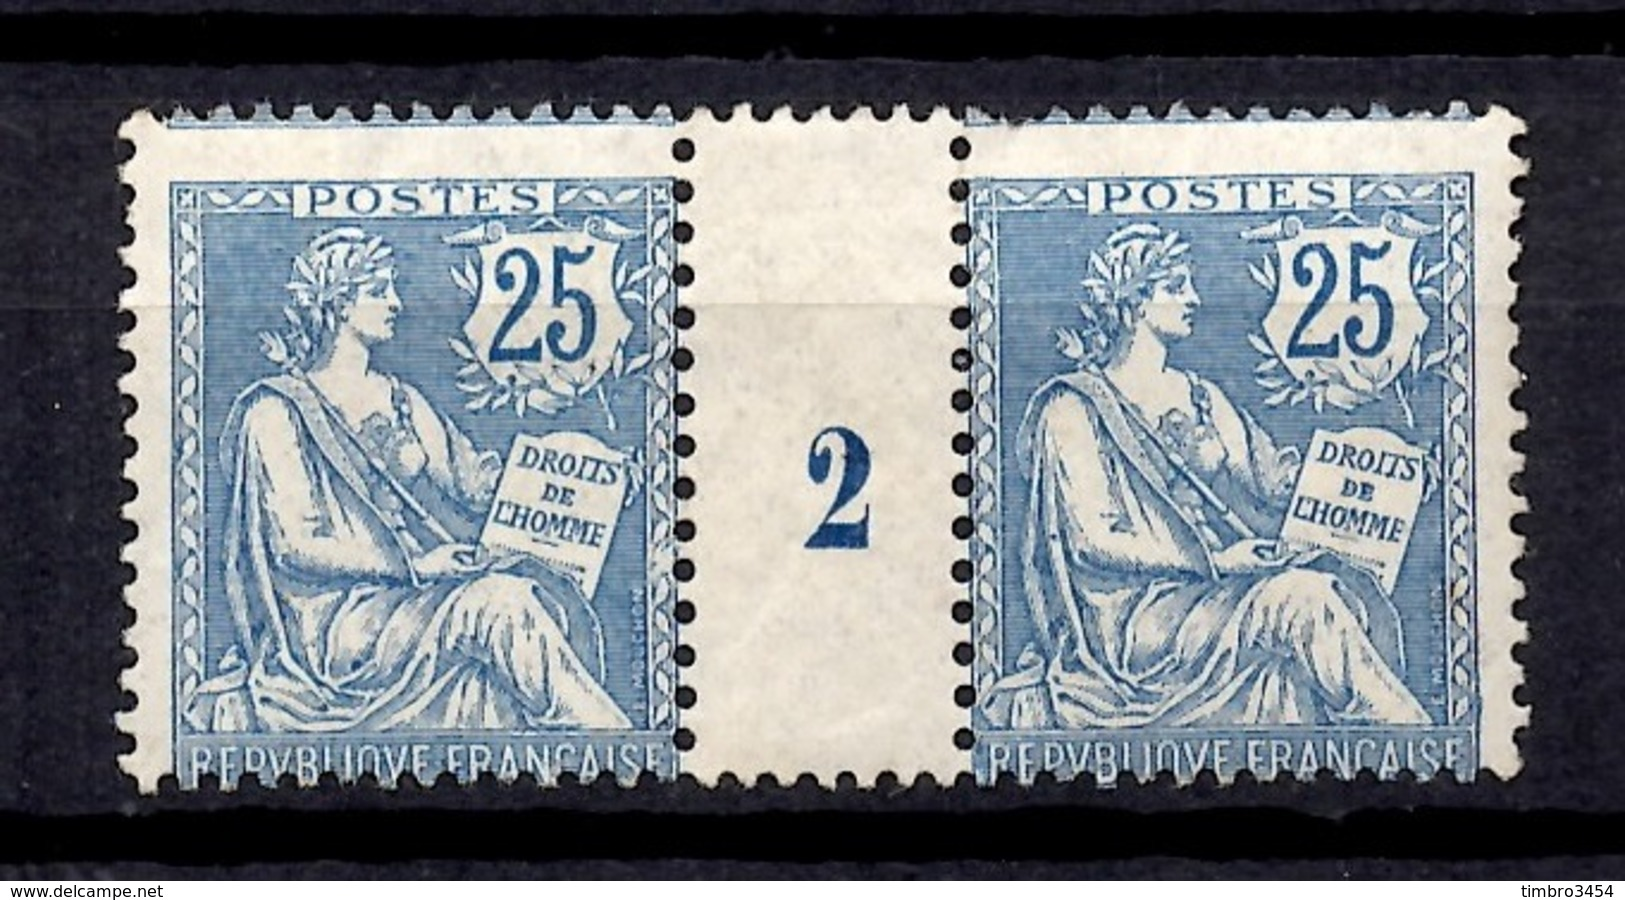 France Mouchon Maury N° 127 Millésime 1902 Neufs *. Gomme D'origine. B/TB. A Saisir! - Millésime